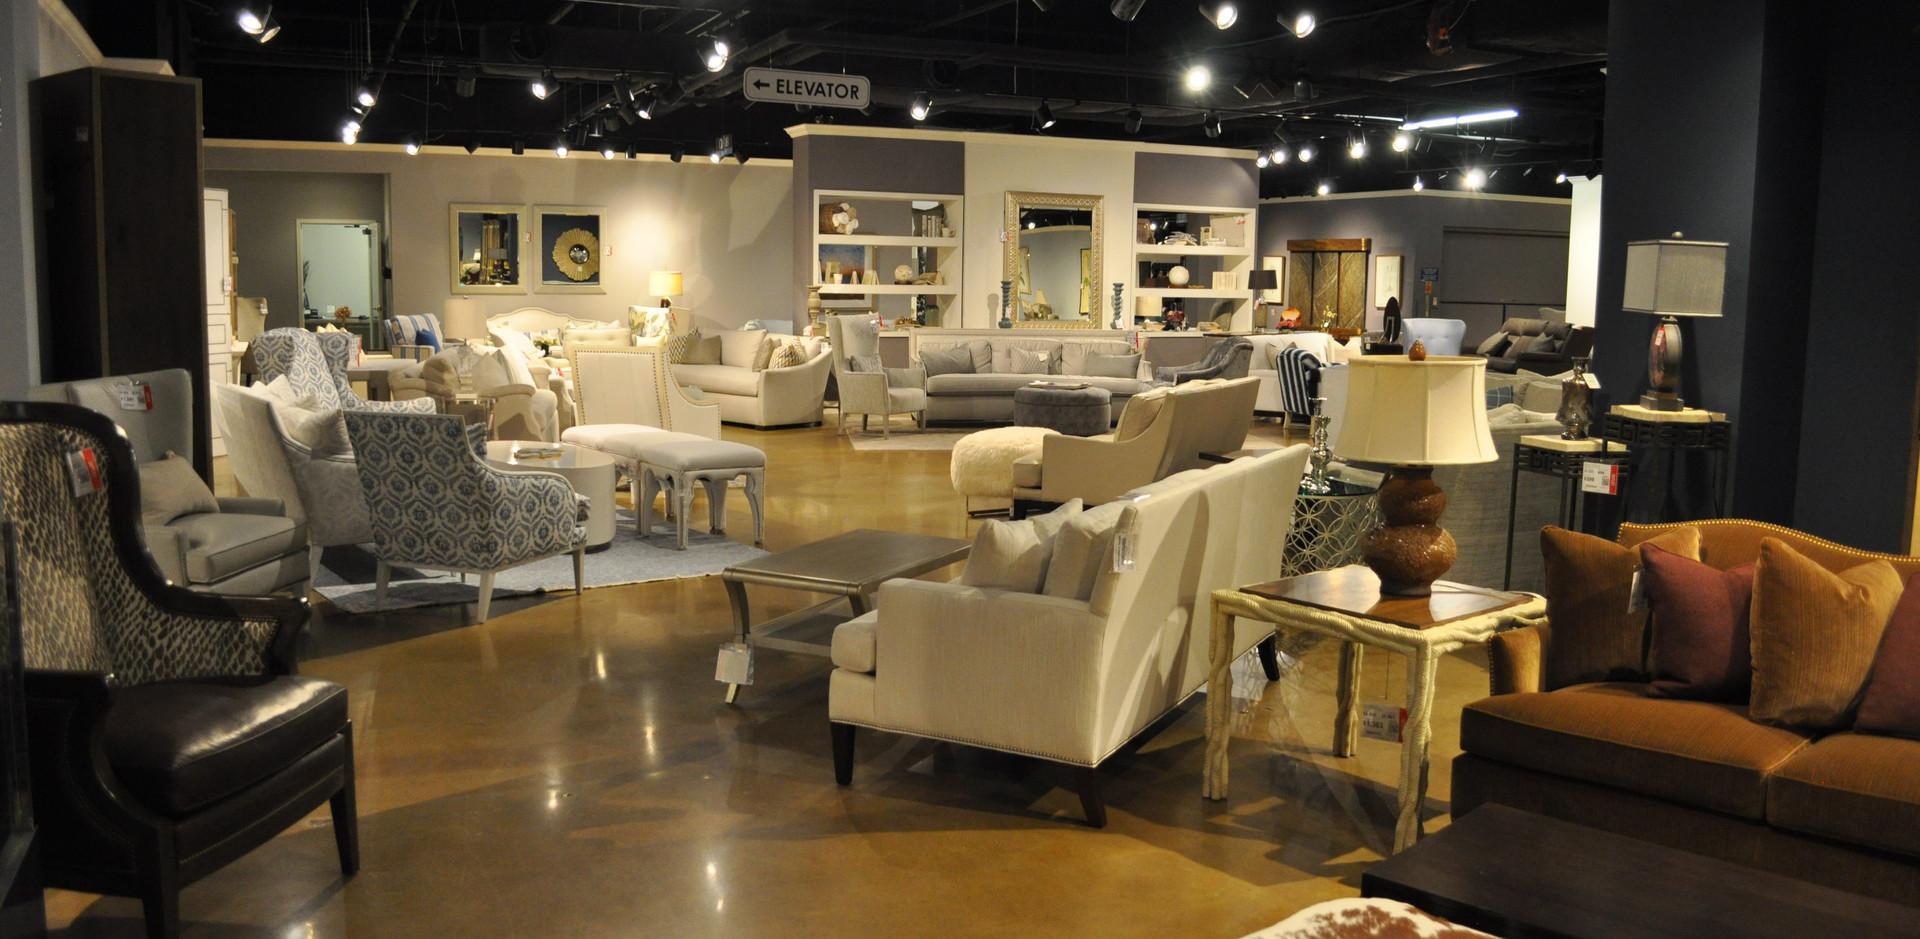 FurnitureLand South, Showroom 2